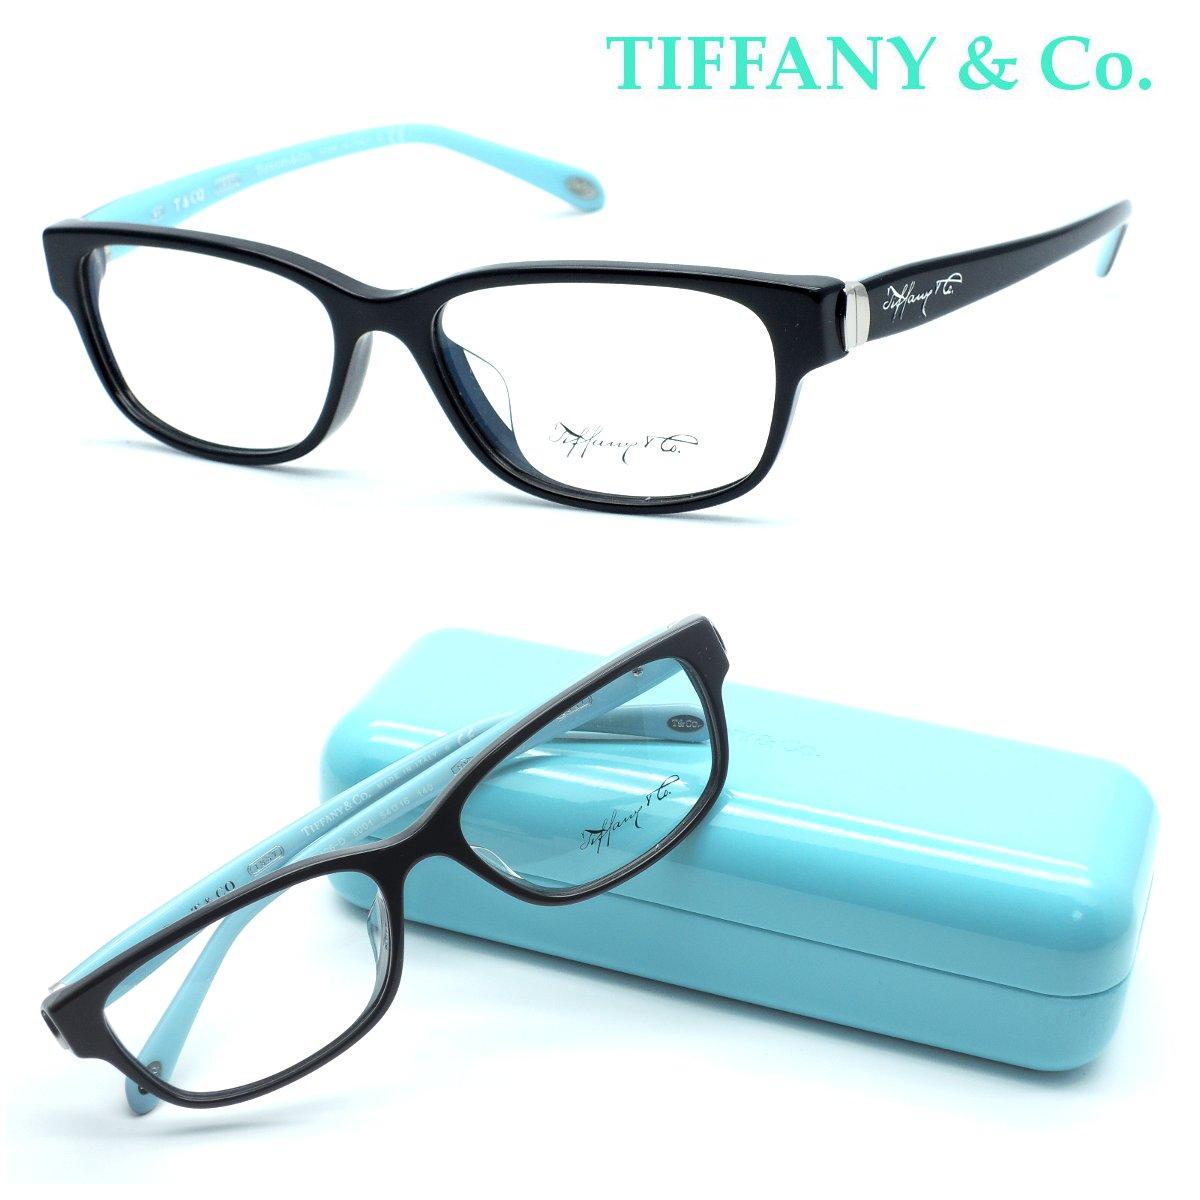 【TIFFANY&Co.】 ティファニー メガネ TF2126-D col.8001 度付又は度無レンズ標準装備 【正規代理店商品】【店内全品送料無料】